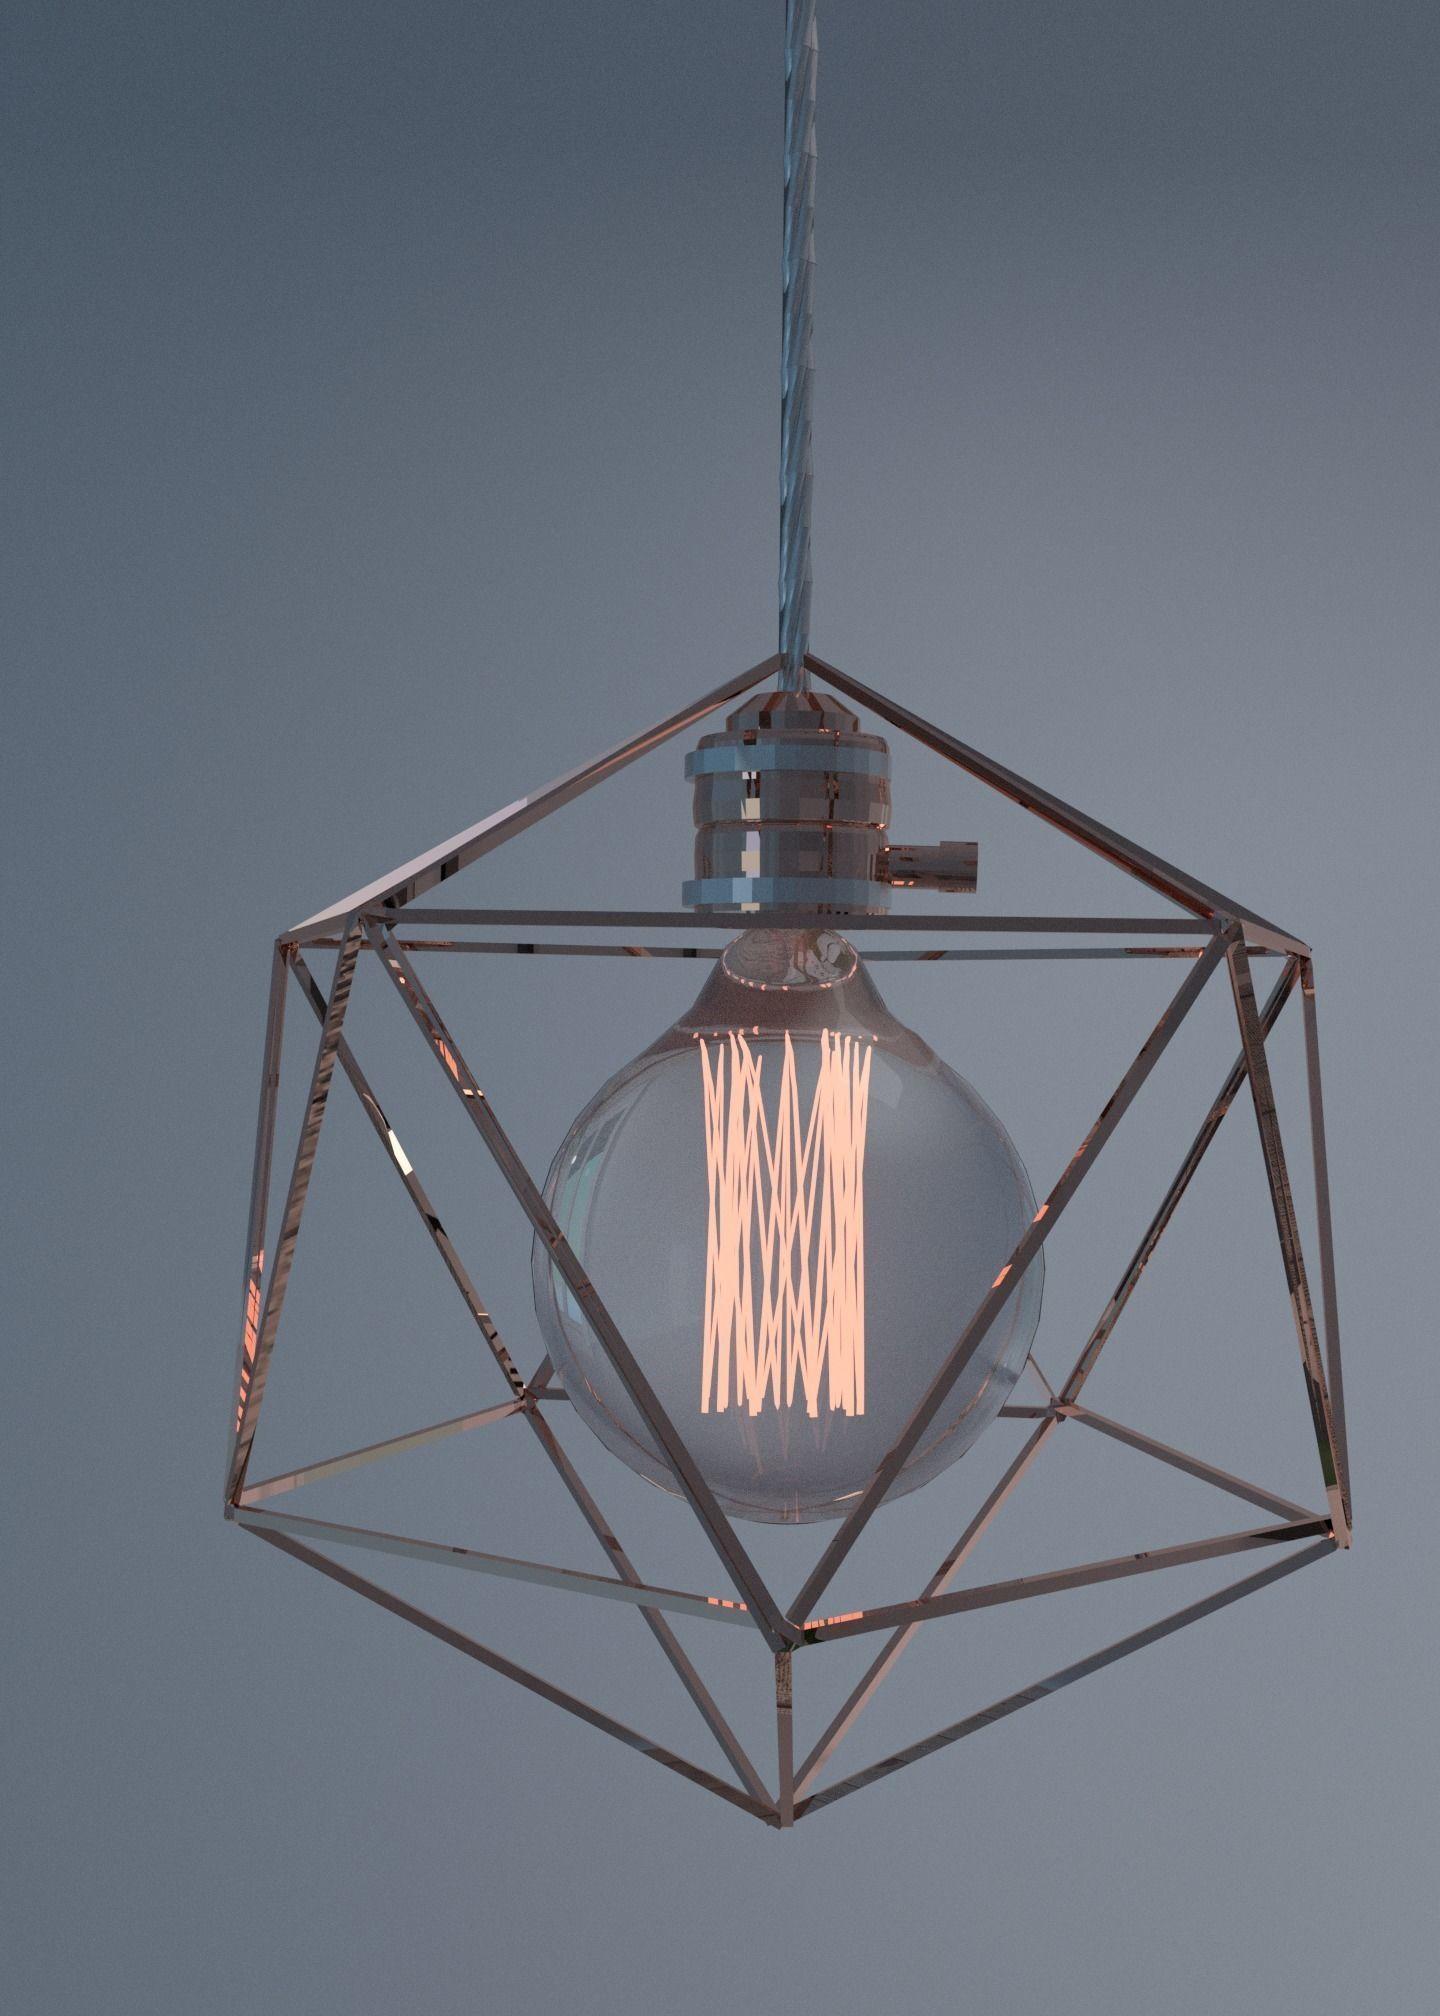 Geometric edison light bulb lamps 3d model obj 3ds fbx stl blend mtl 1